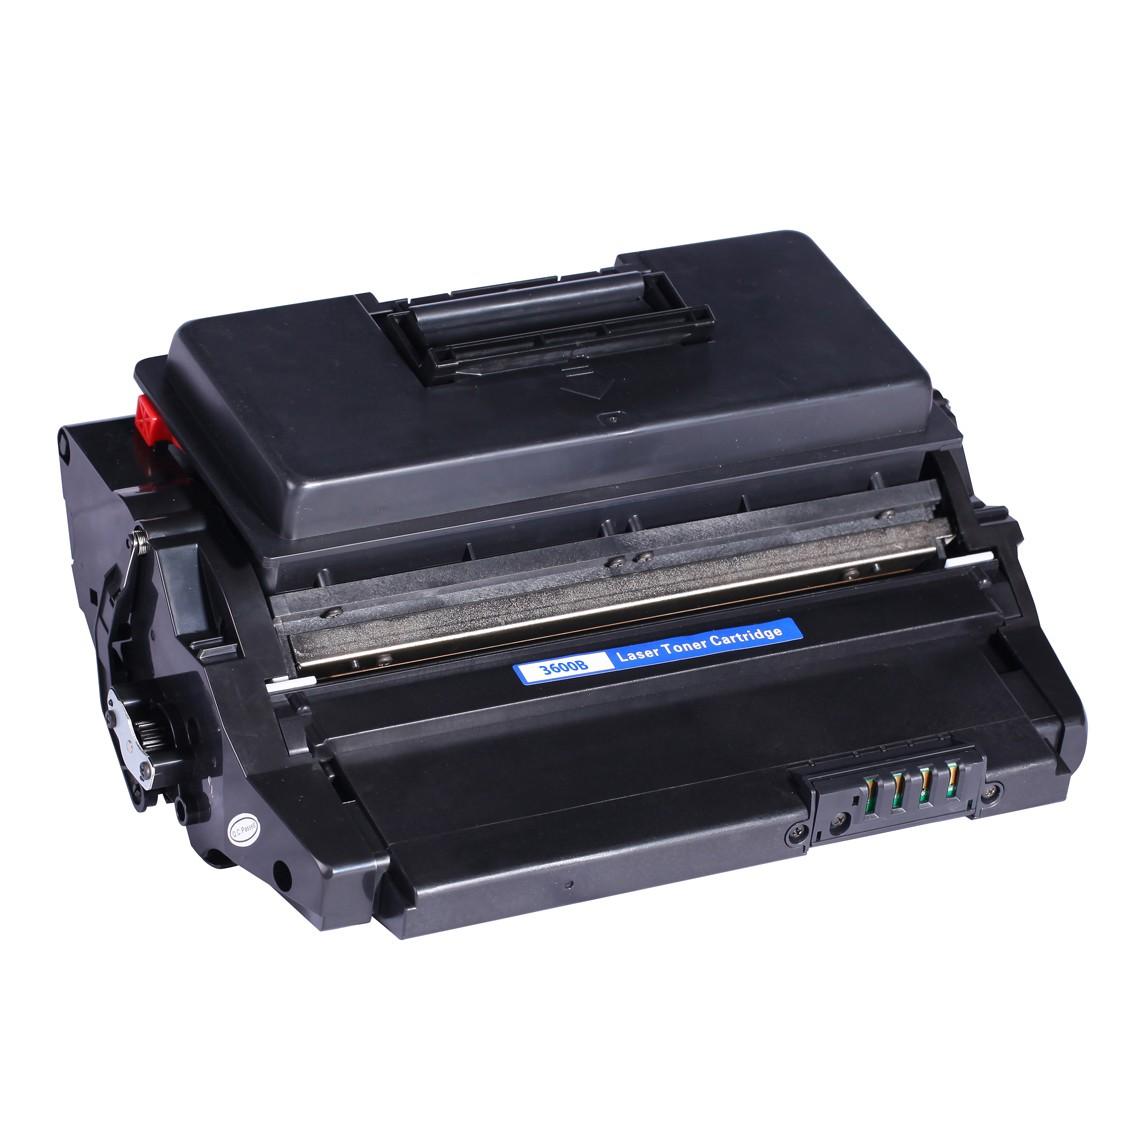 Image of   Xerox 3600B BK (106R01372) Lasertoner, Sort, Kompatibel (20000 sider)